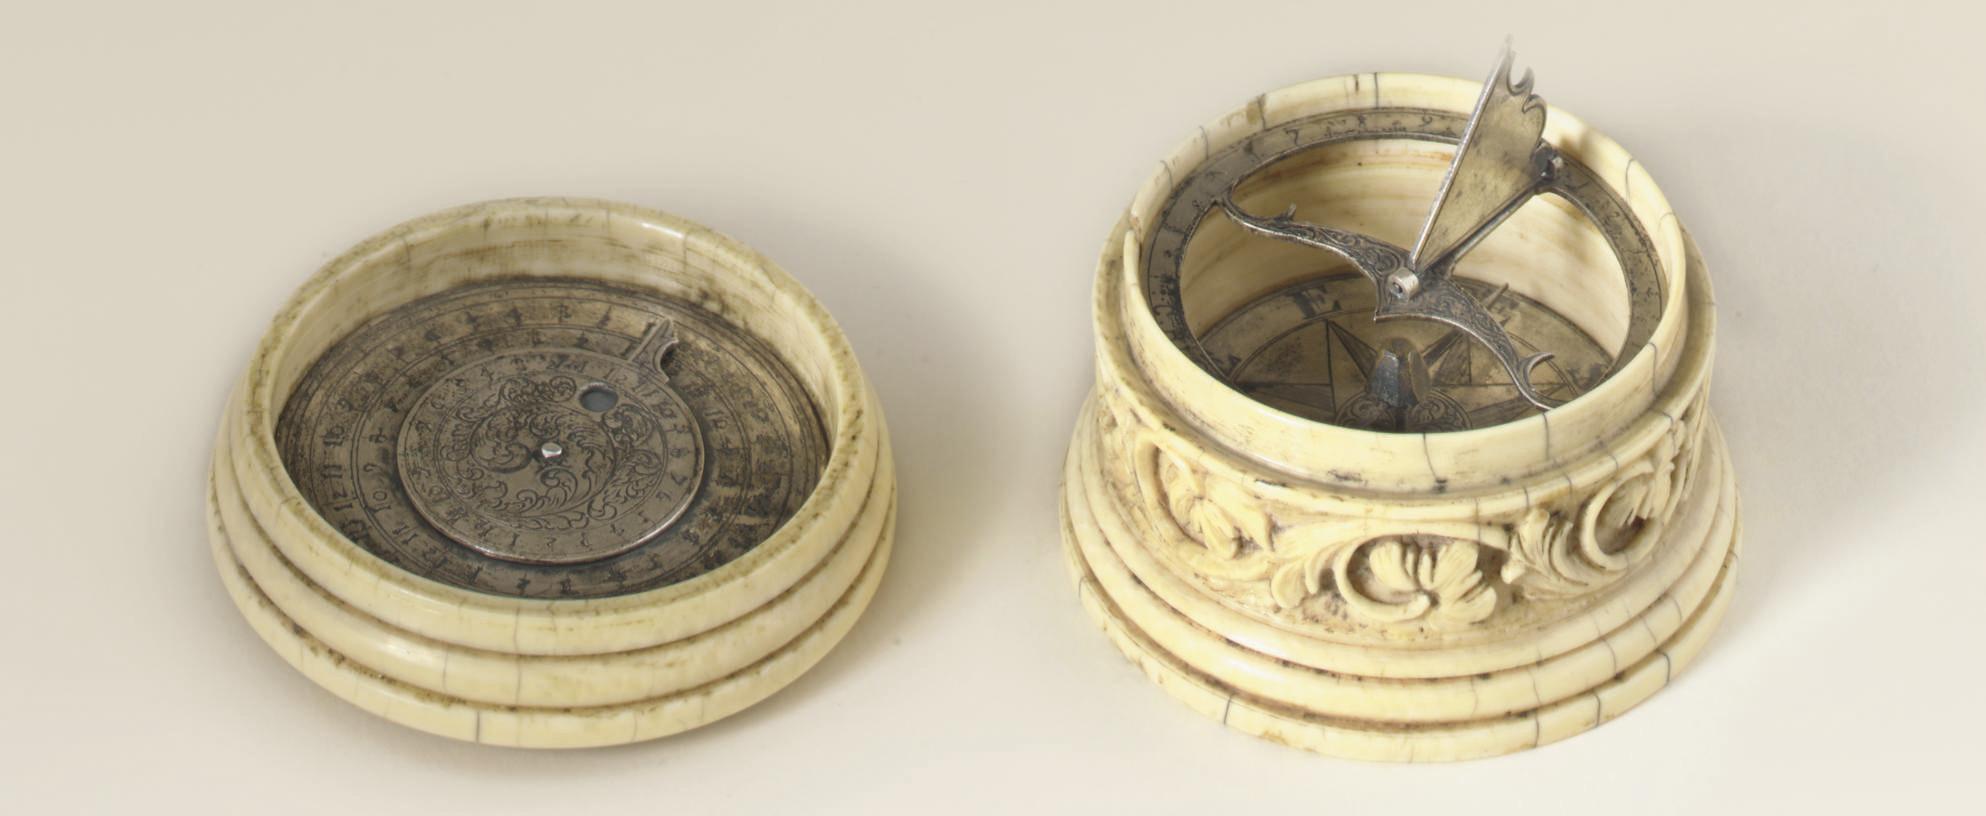 French ivory barrel compendium